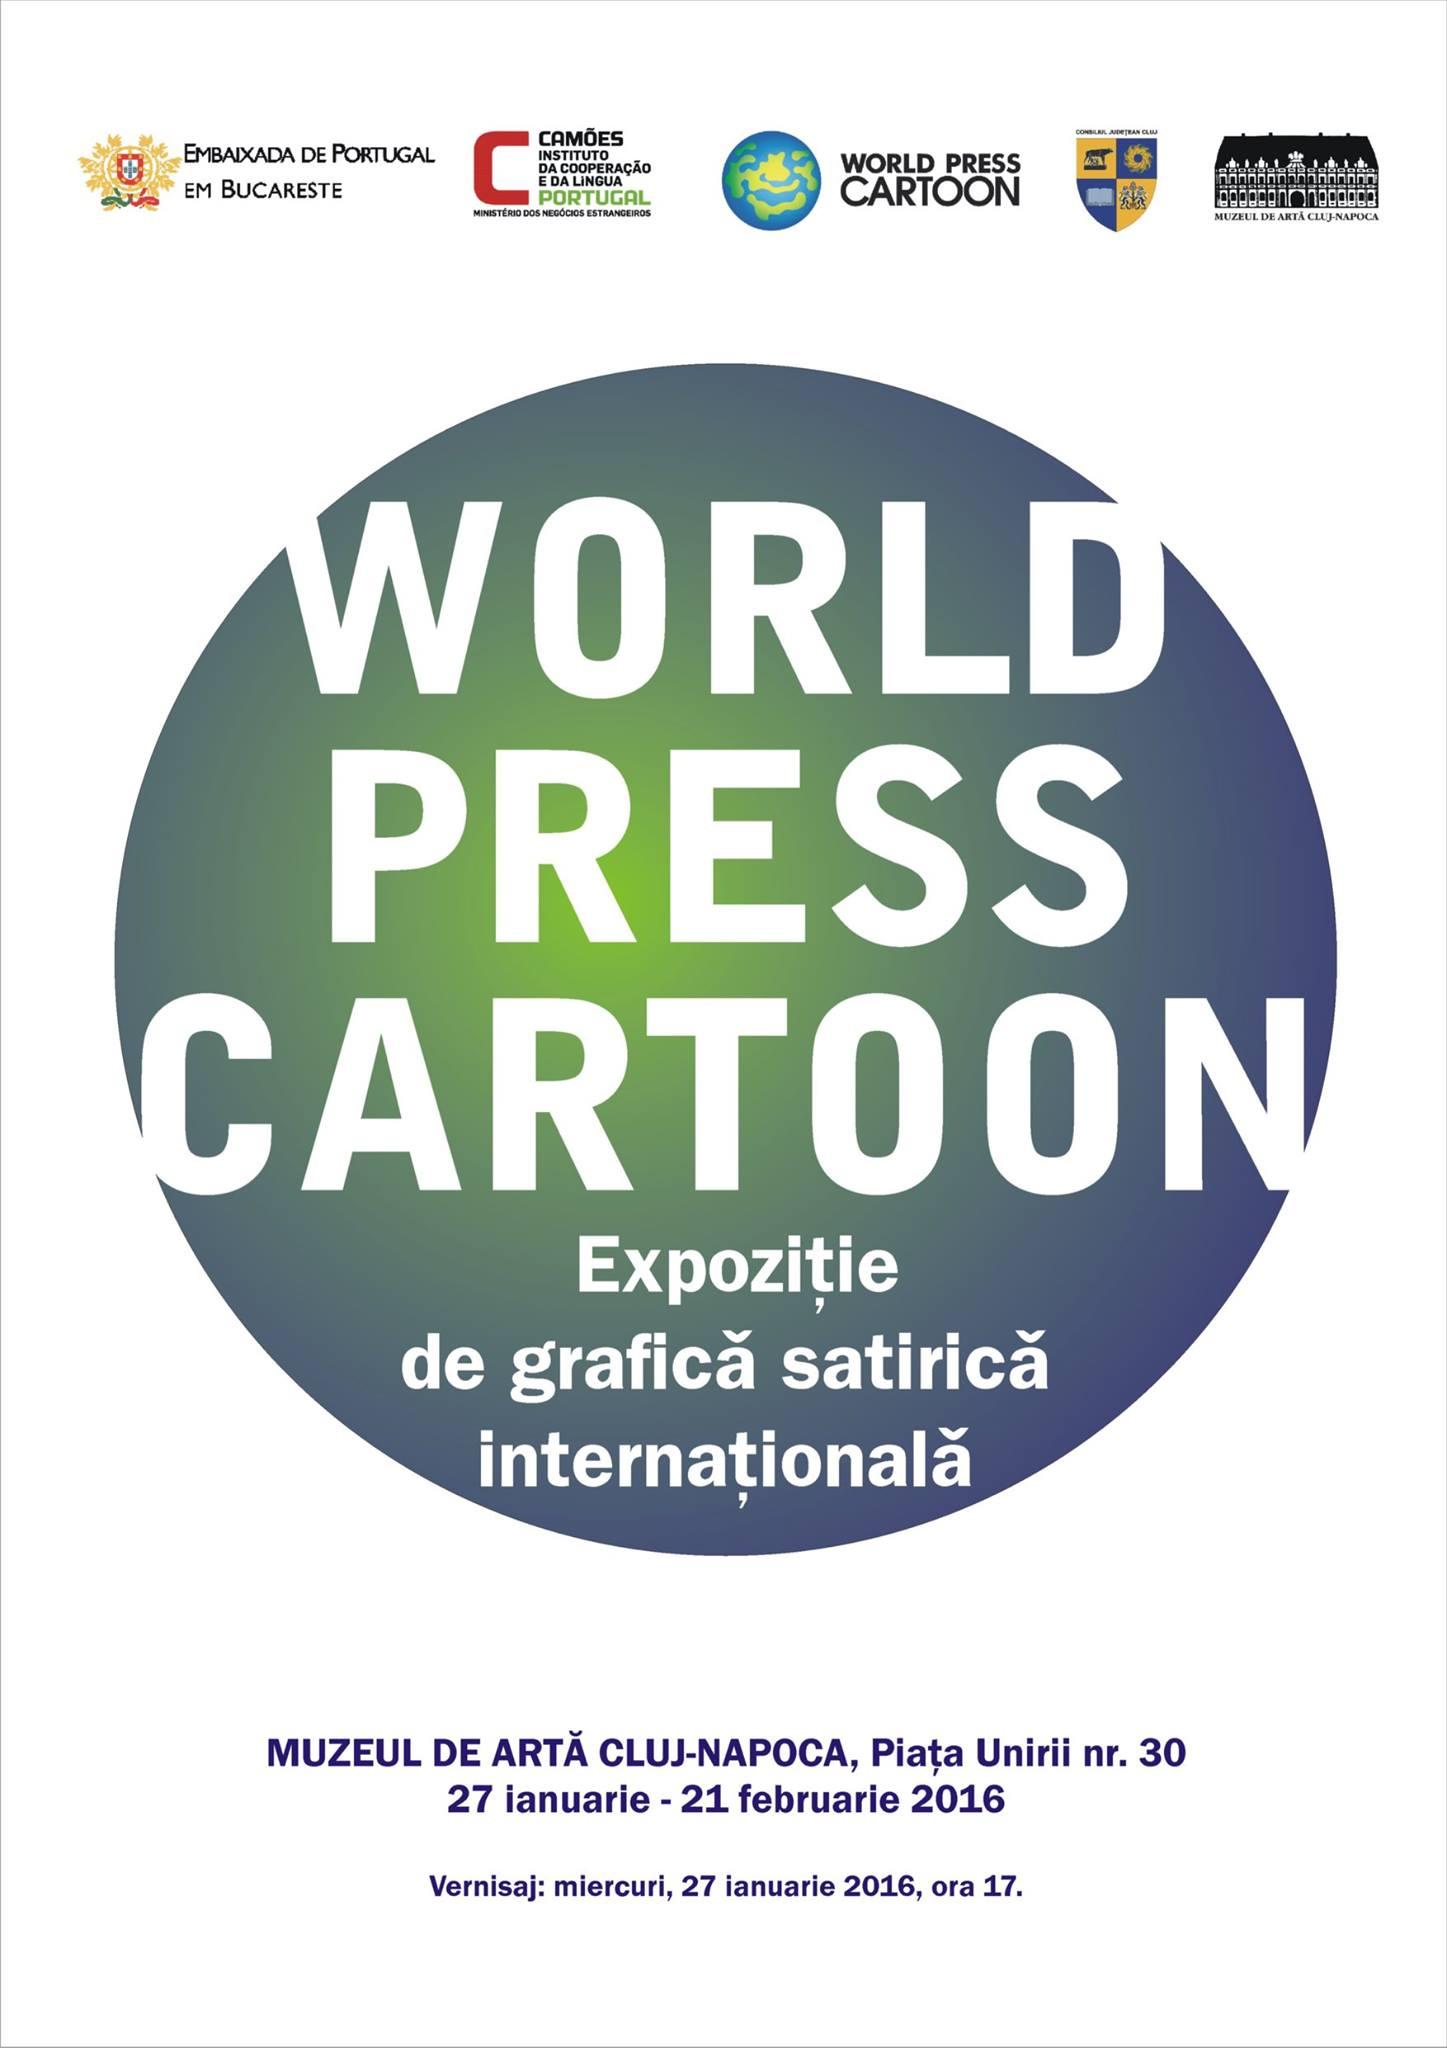 World Press Cartoon (7)